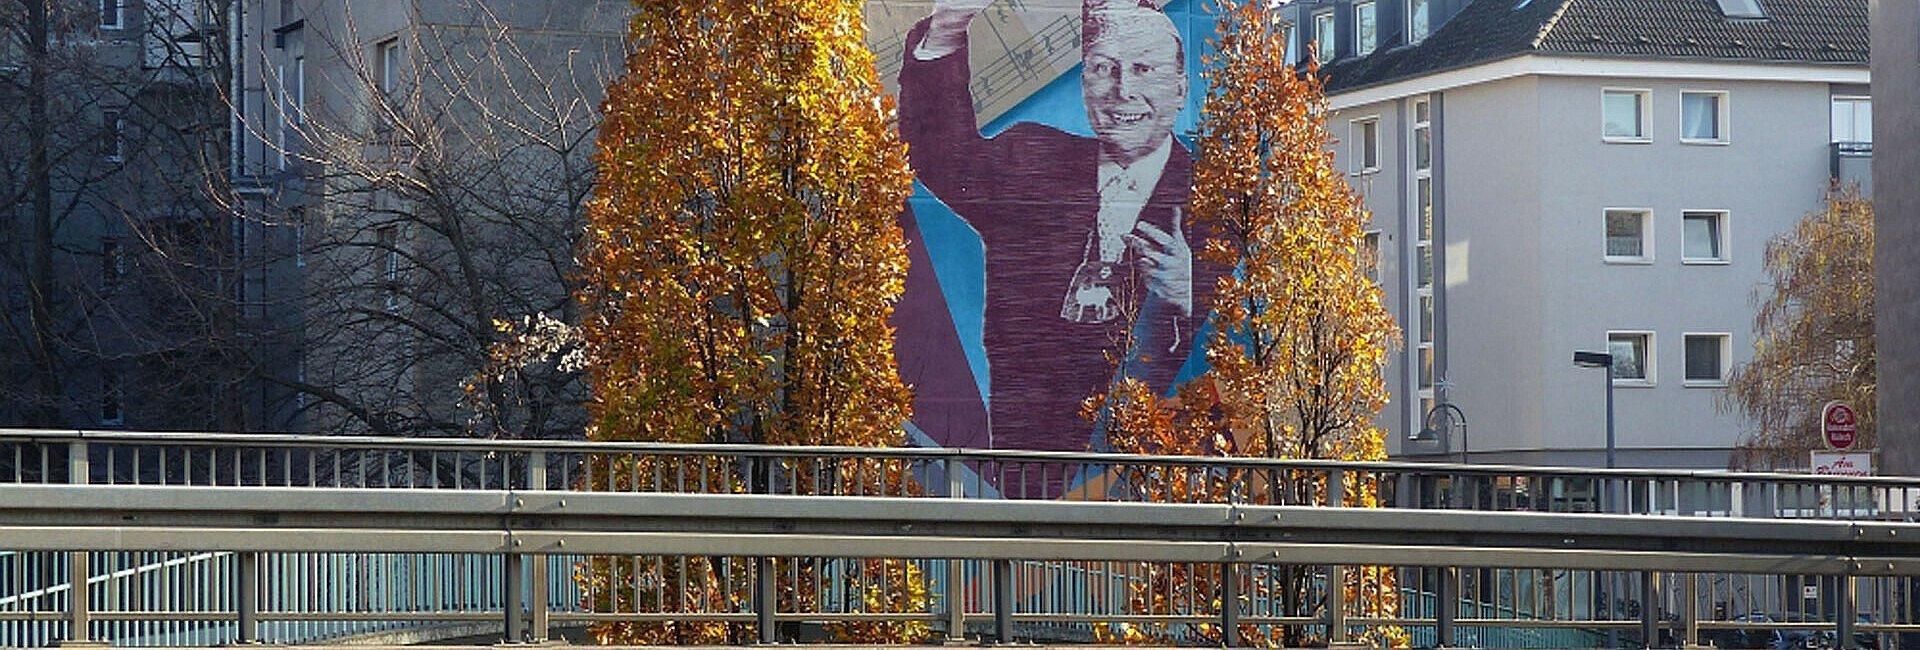 Mural des Künstlerkollektivs Highlightz am Karl-Berbuer-Platz in der Südstadt